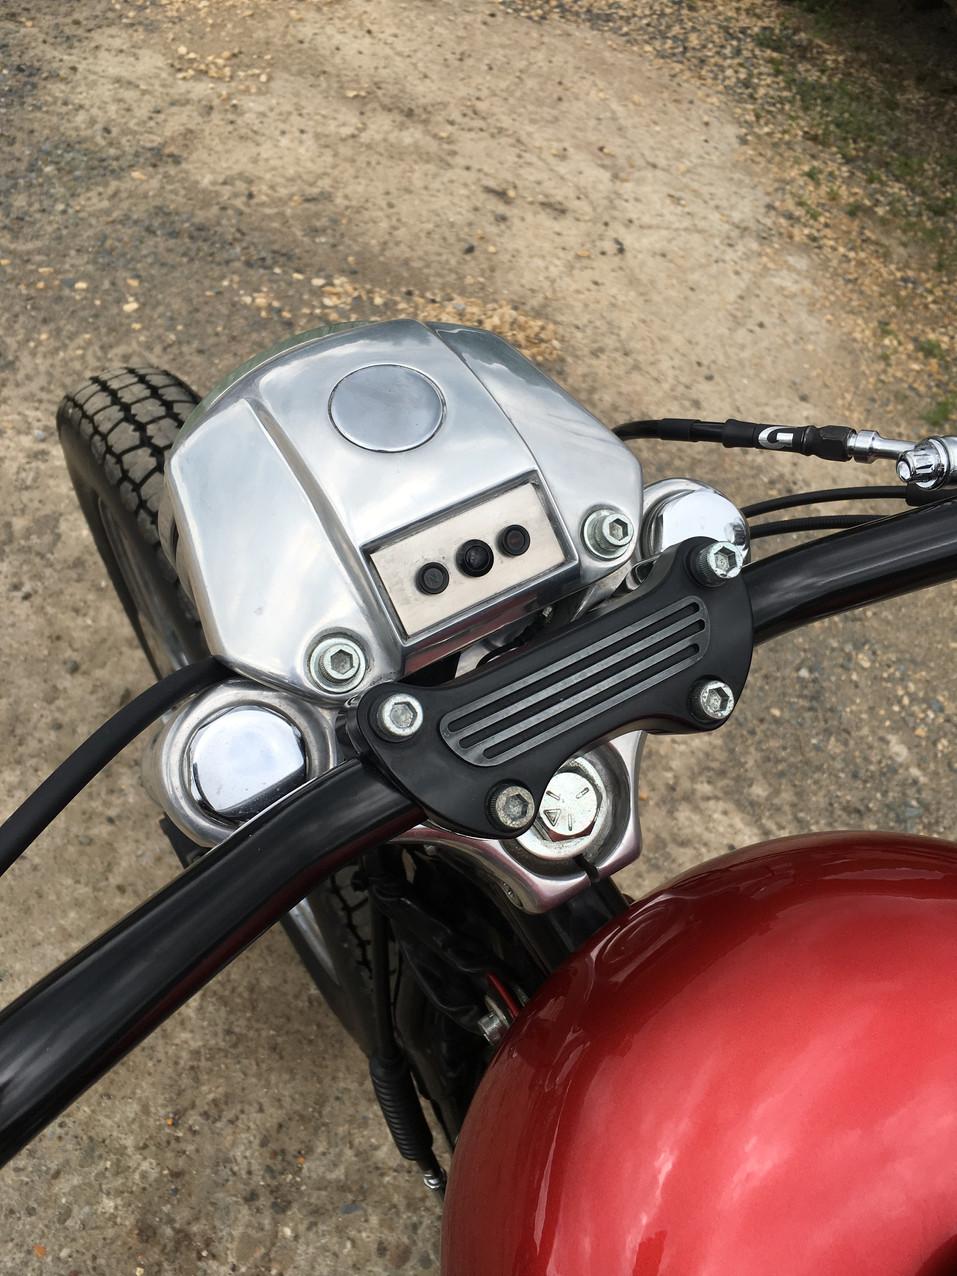 HD XL TRACKER - TWISTED PISTONS